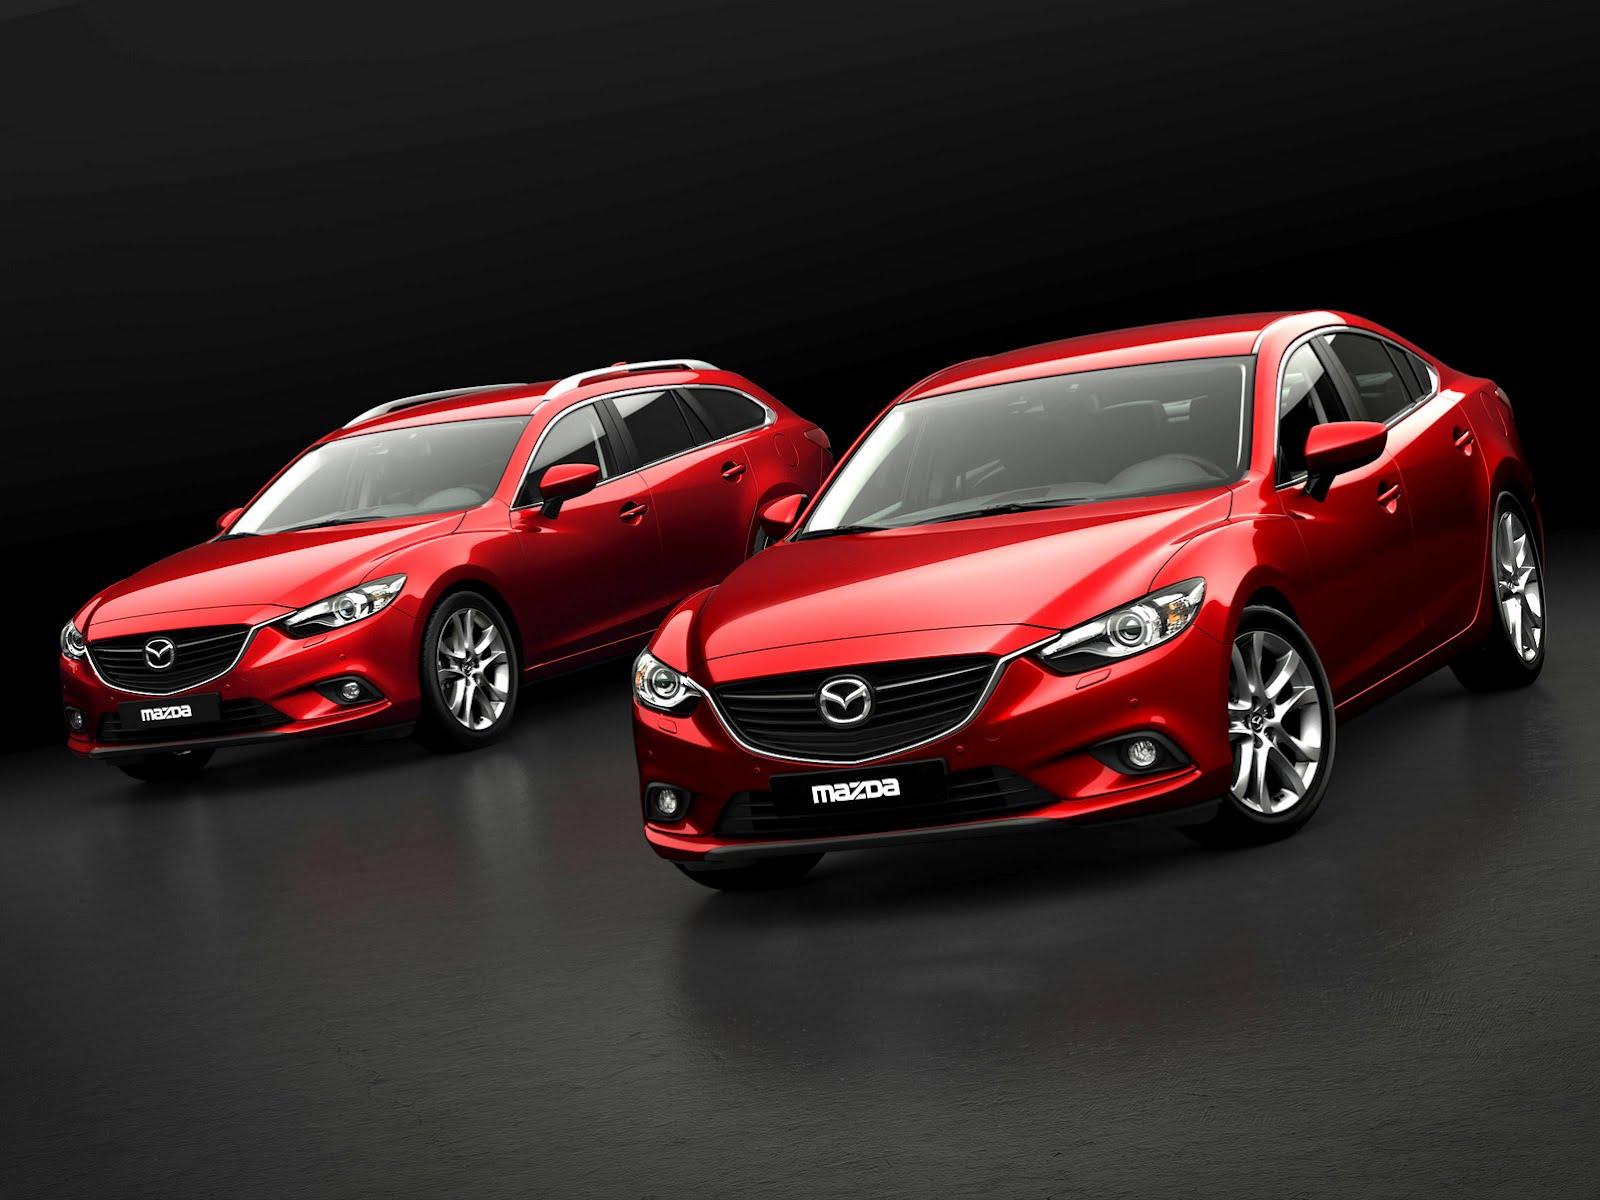 Mazda 3 Cargo Space Dimensions >> Nancys Car Designs: 2013 Mazda 6 Wagon